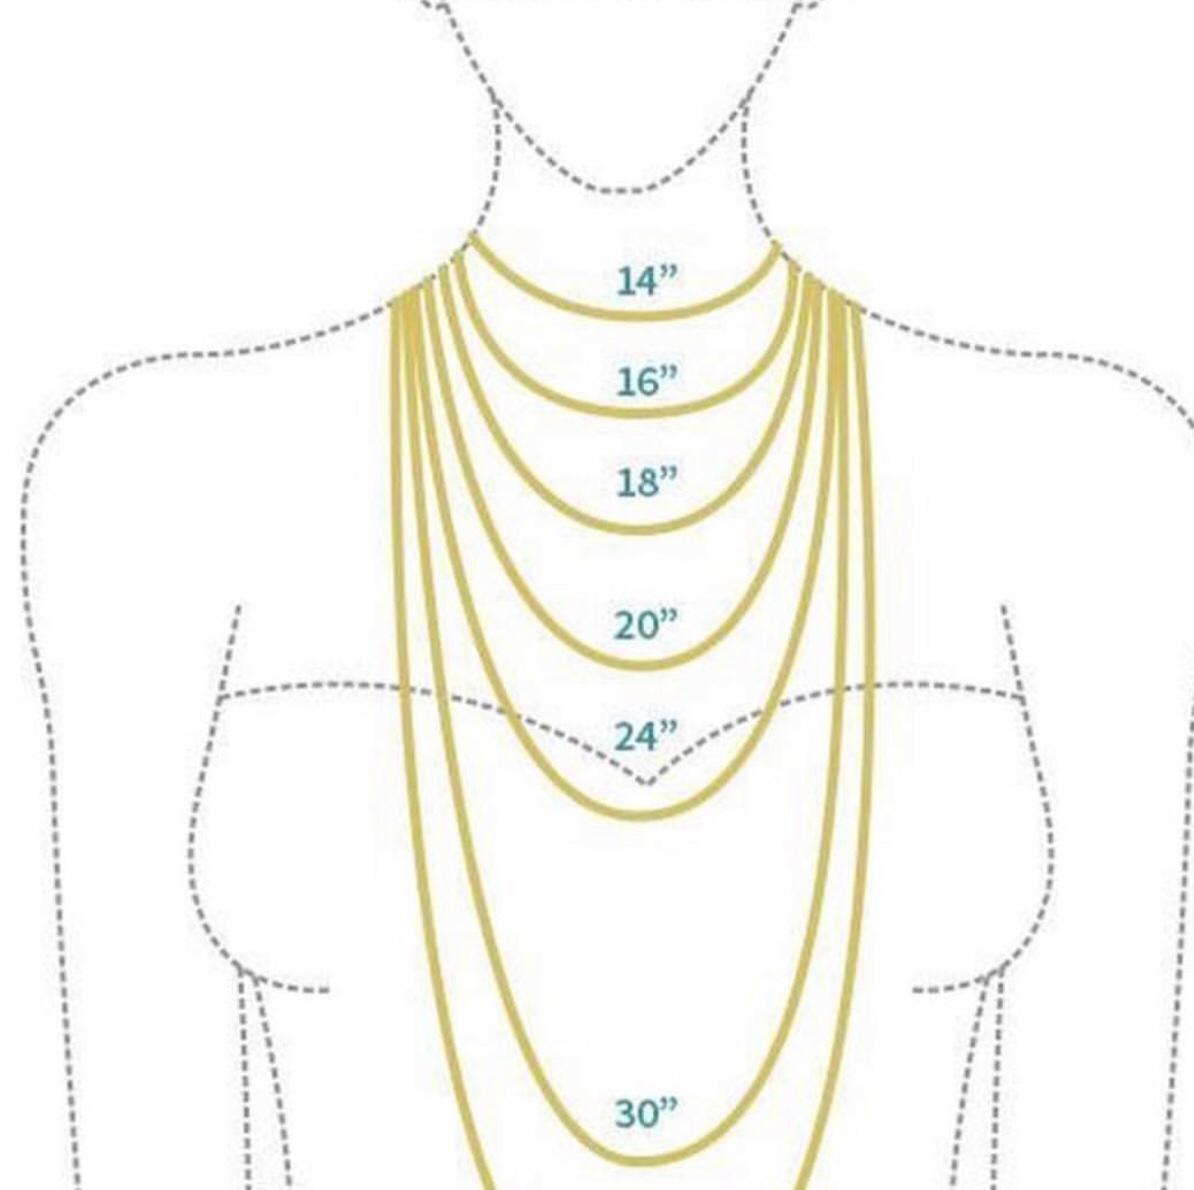 Necklace Length Diagram Customised Latter Rain Necklace